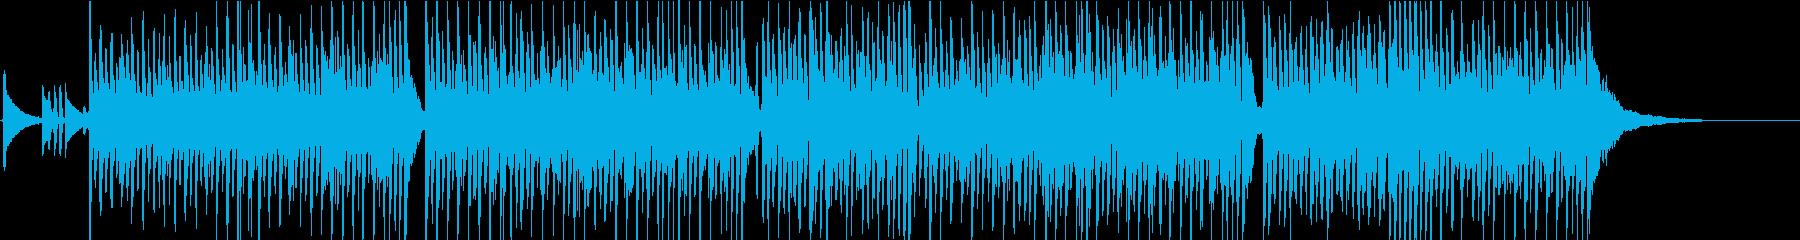 My first ragtimeの再生済みの波形